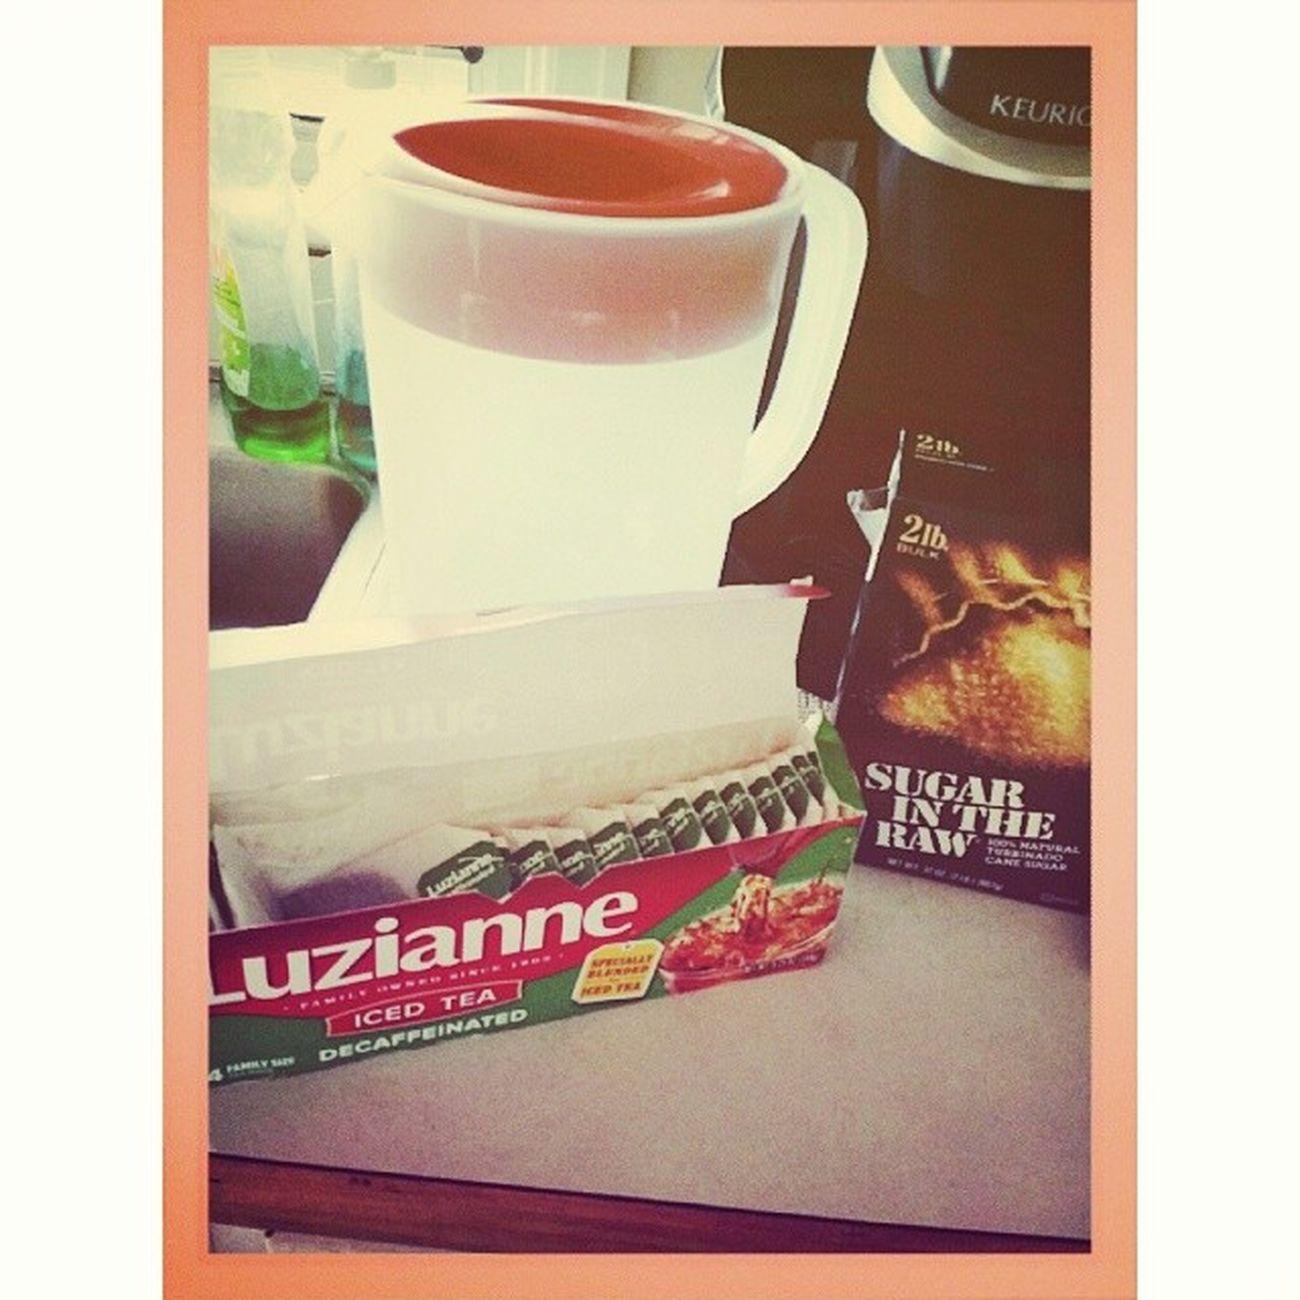 Sweet tea! Sugarintheraw Decaf